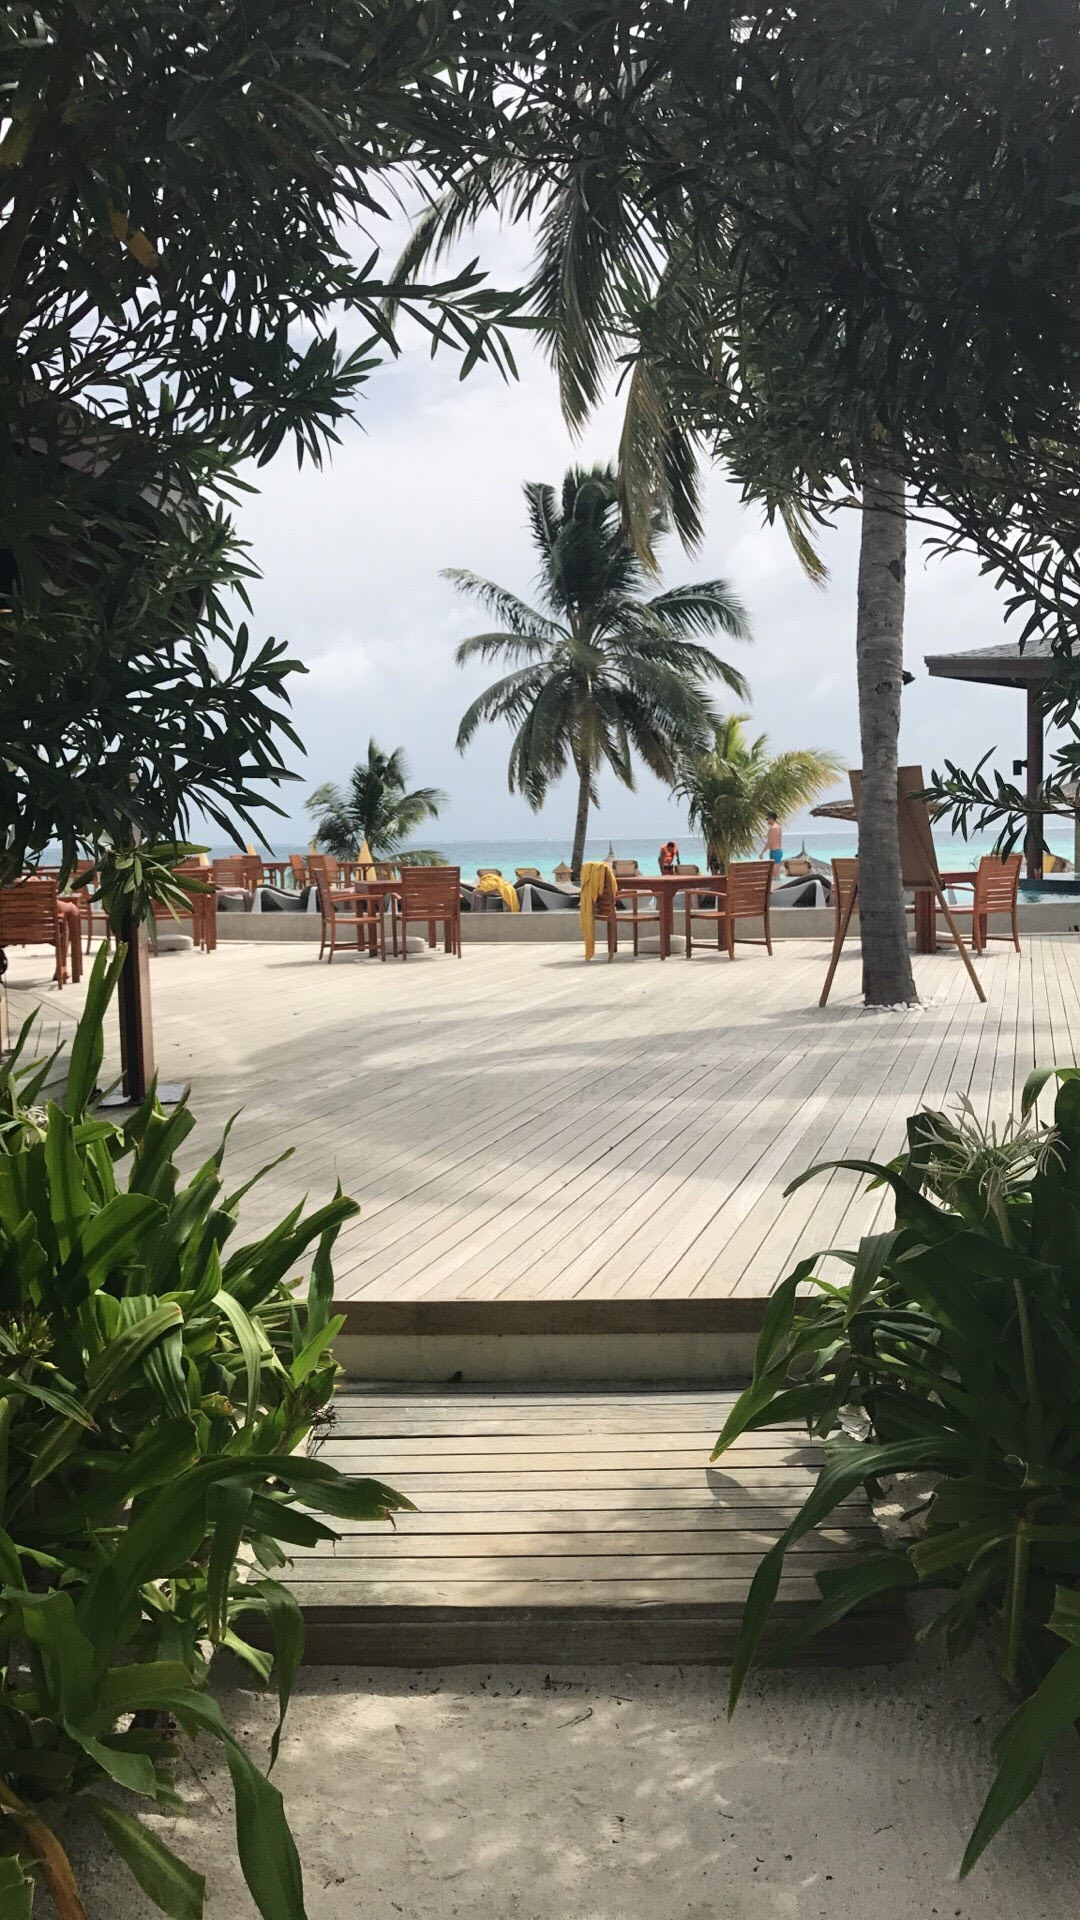 invite-to-paradise-maldives-sri-lanka-specialists-experts-travel-agent-tour-operator-customer-feedback-lucas-emily-fenning-elephant-orphanage-centara-ras-fushi-pool-area.jpg